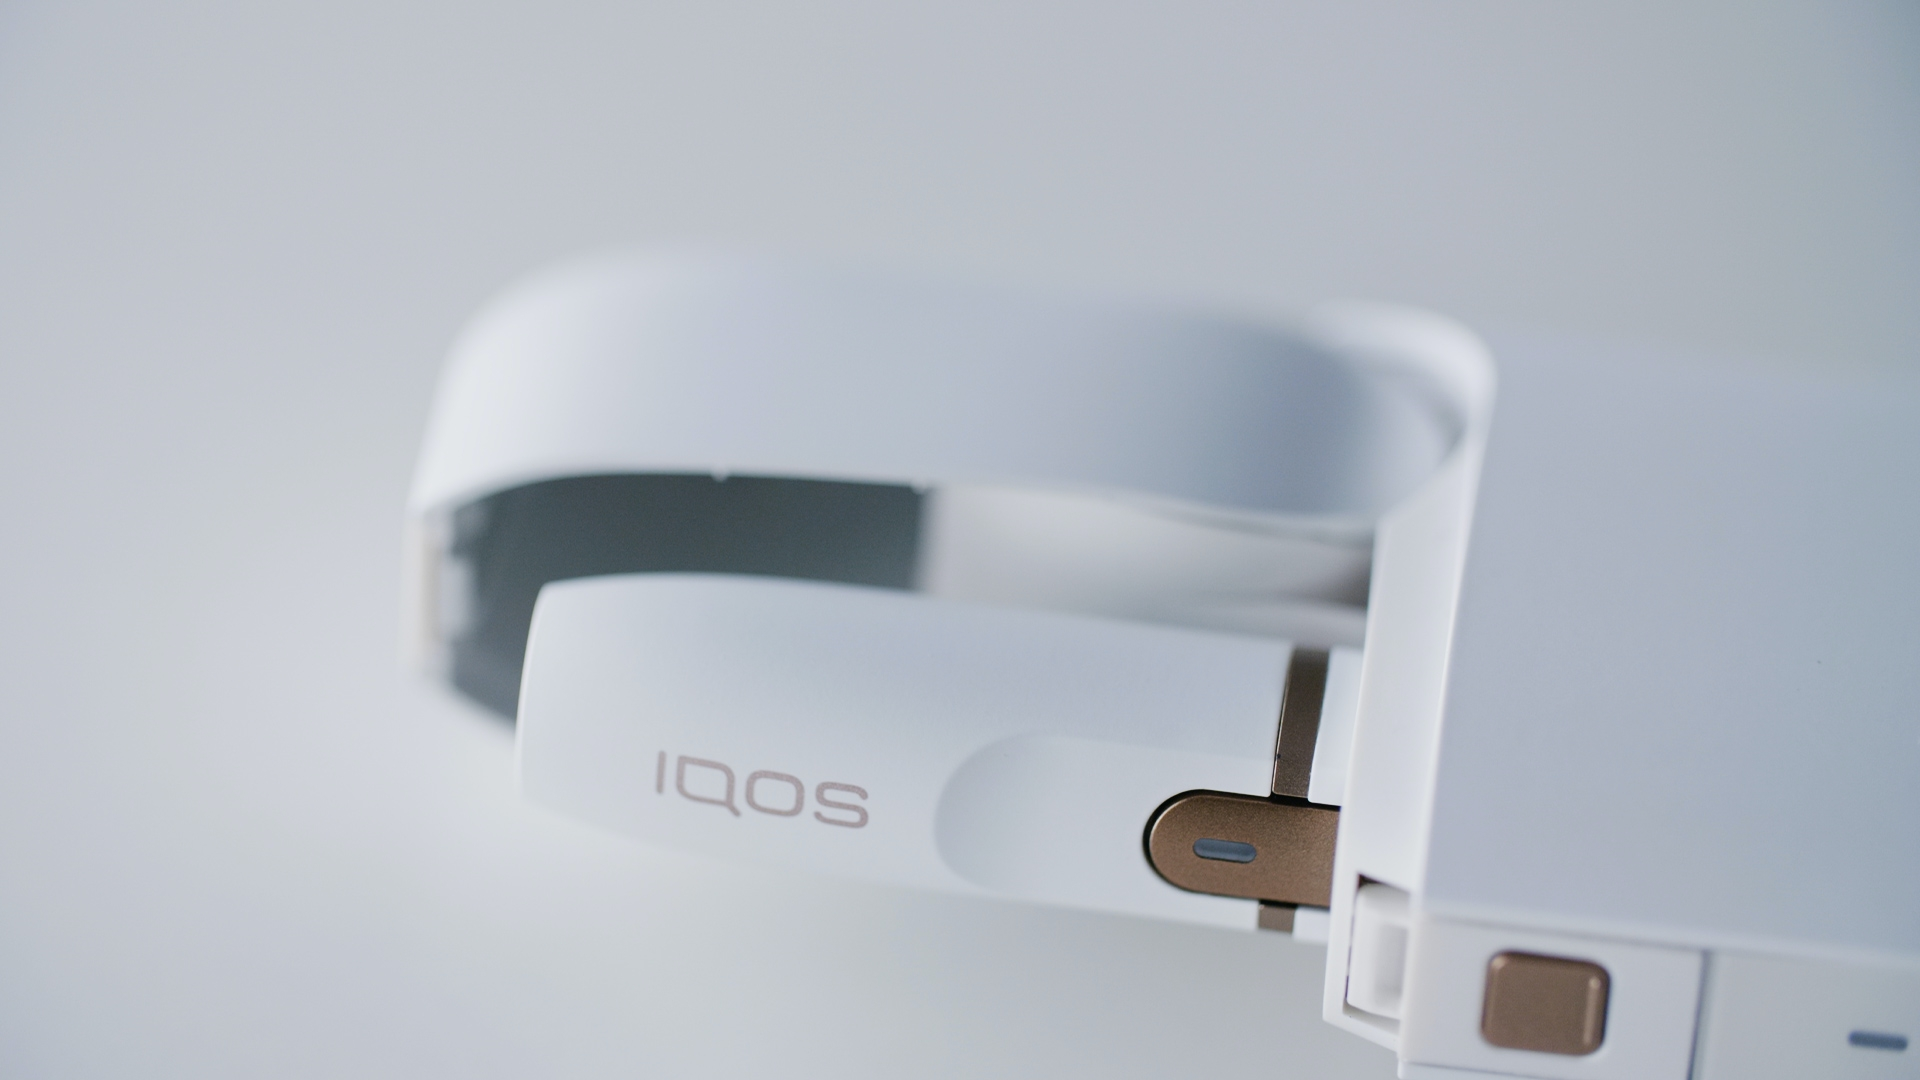 04_IQOS-QOACH-_NEW SENARIO_COLOR  Copy 02.00_00_01_21.Still020